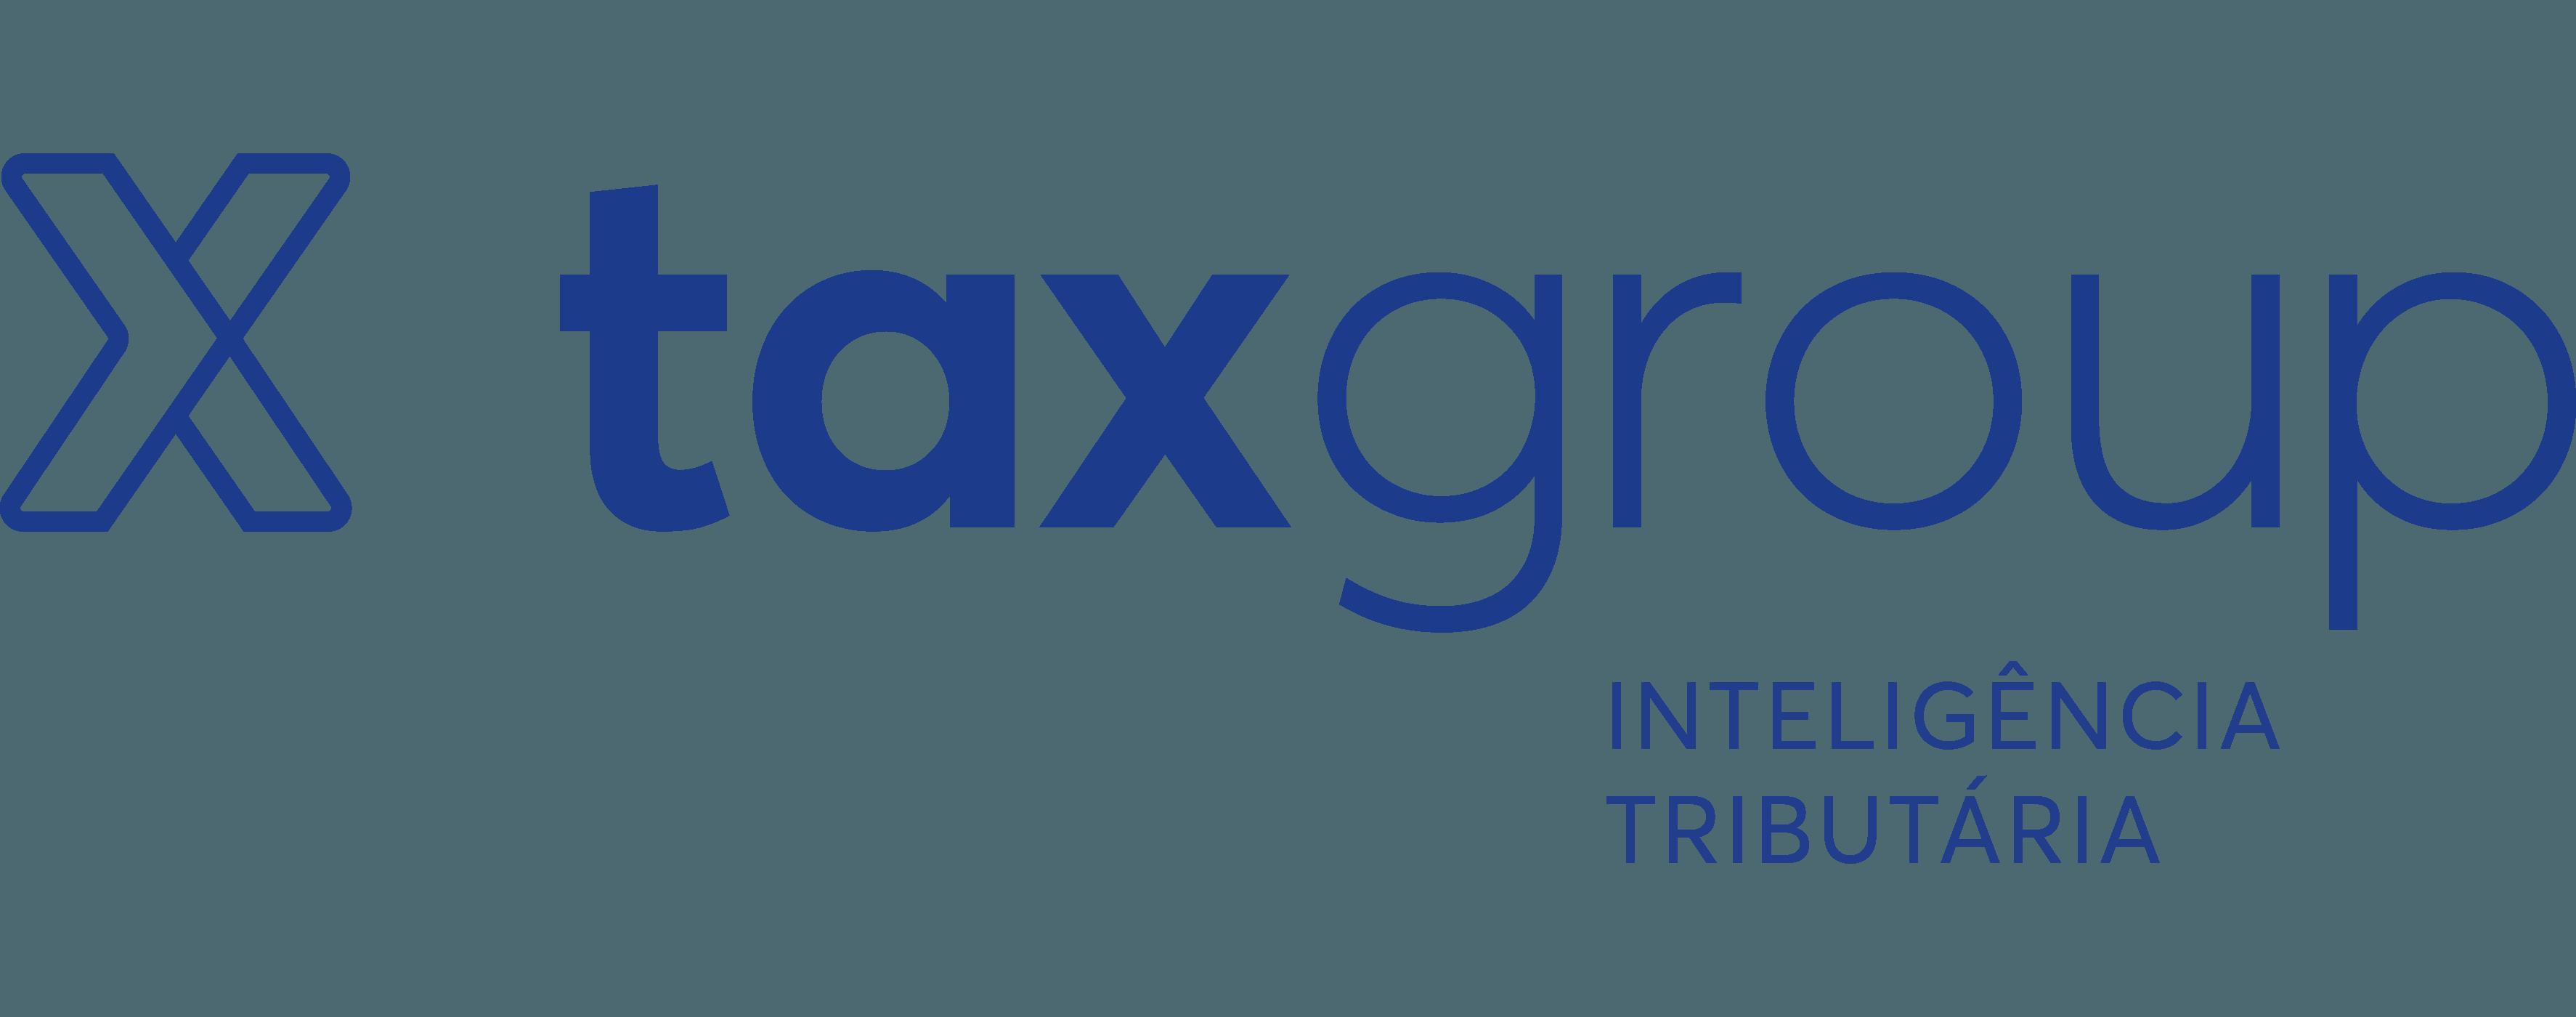 Logotipo da empresa Tax